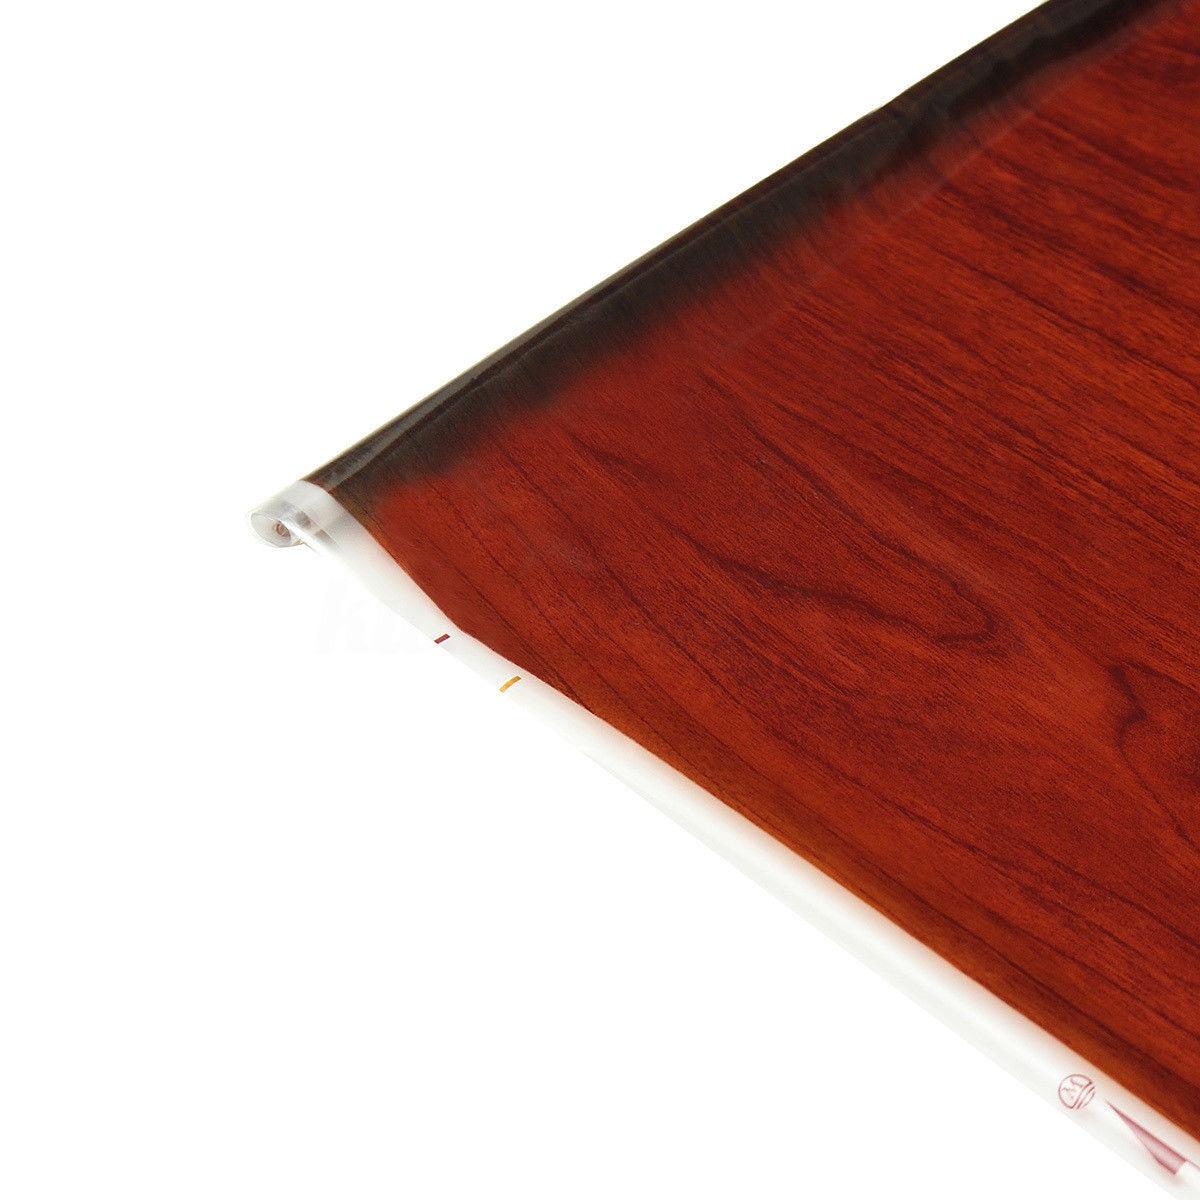 JX-LCLYL 50*100cm Wood Grain Print Hydrographic Water Transfer Film Hydro Dipping Film